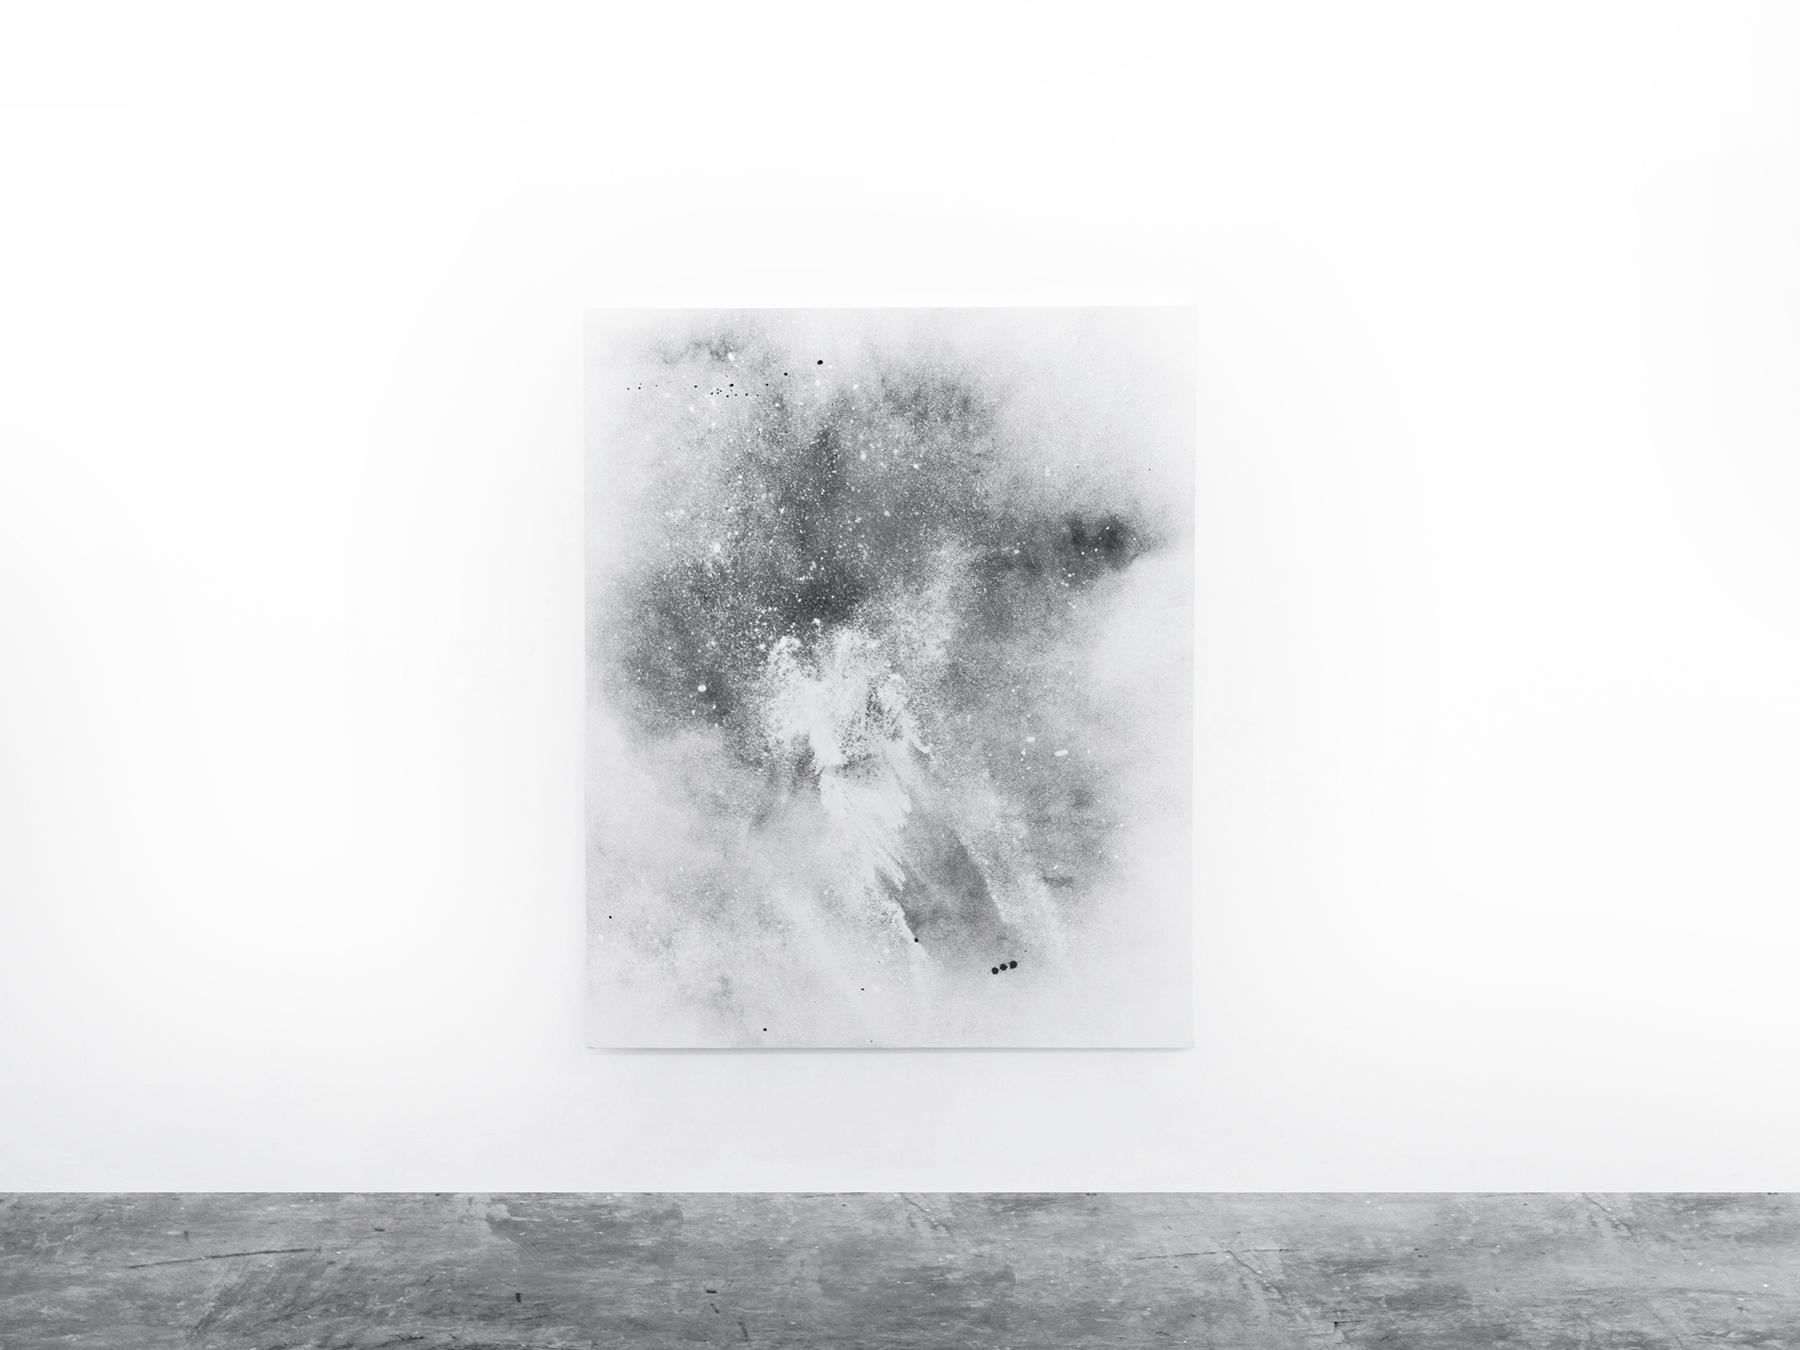 alessandro moroder   dirt painting   160 x 125 cms  dirt, enamel on canvas  2016